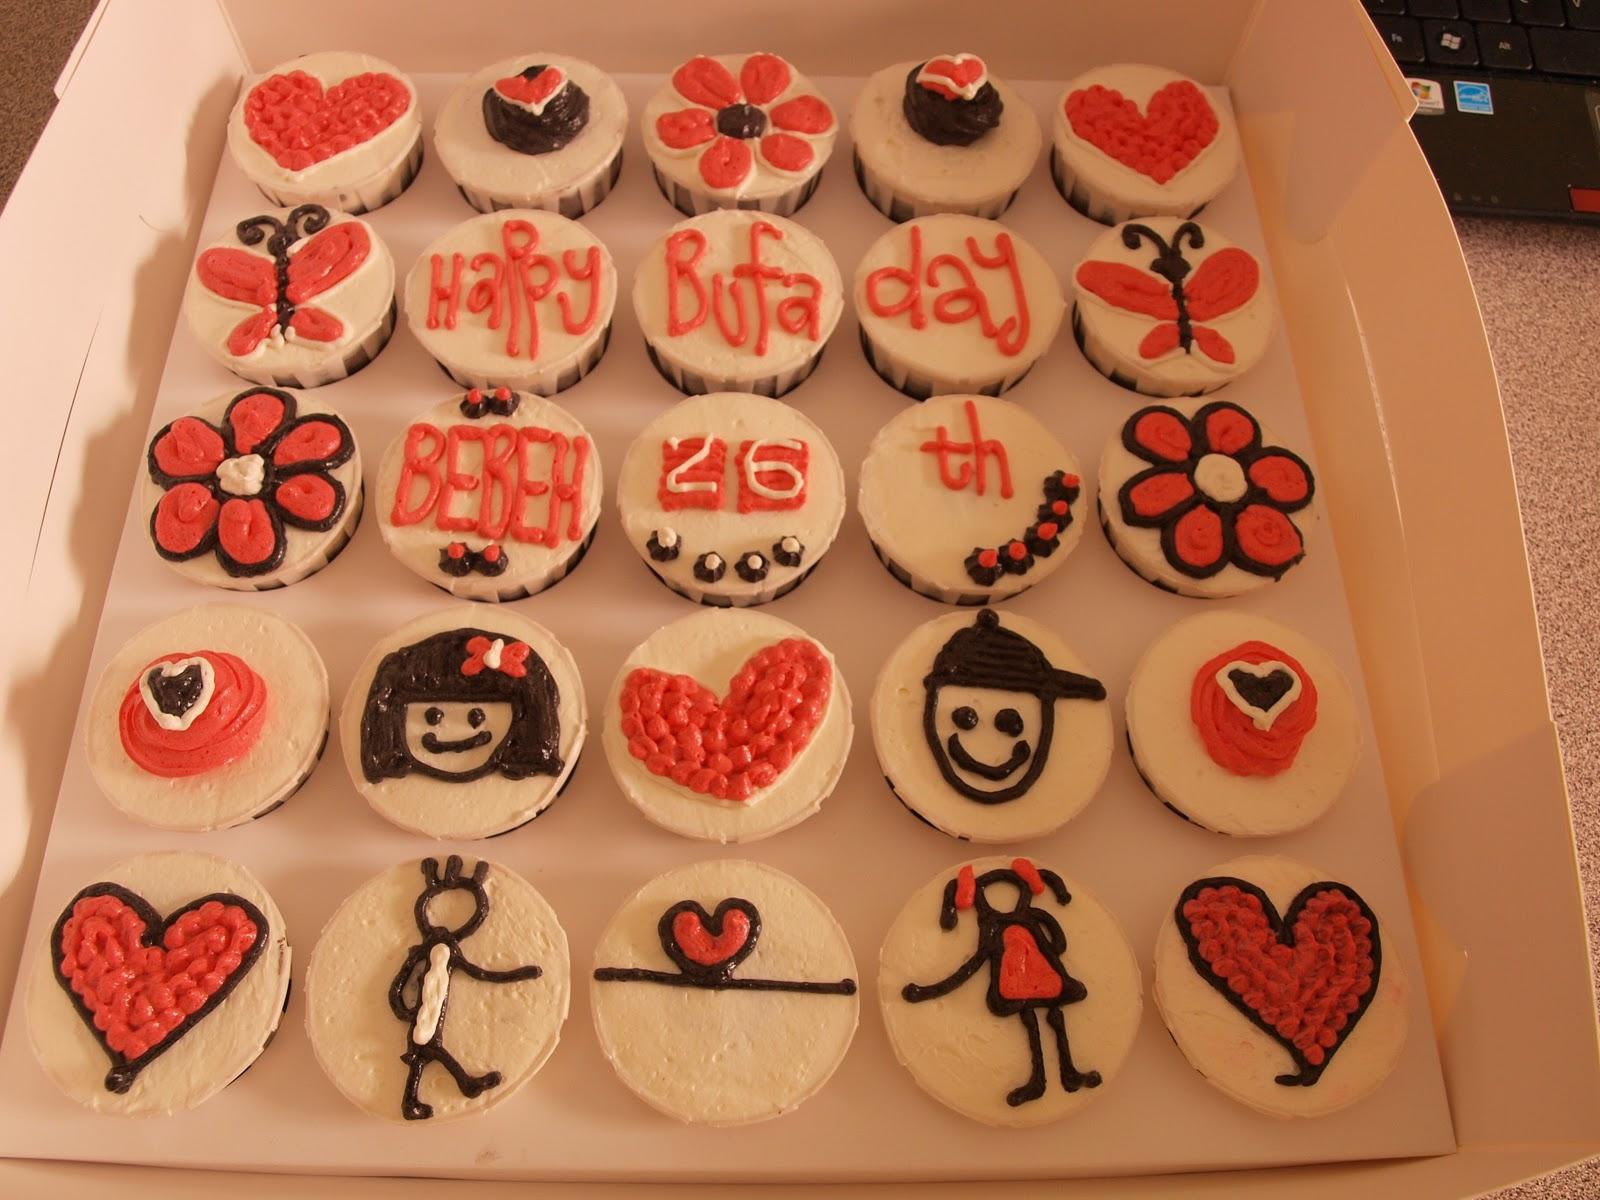 boyfriend cupcakes - photo #10